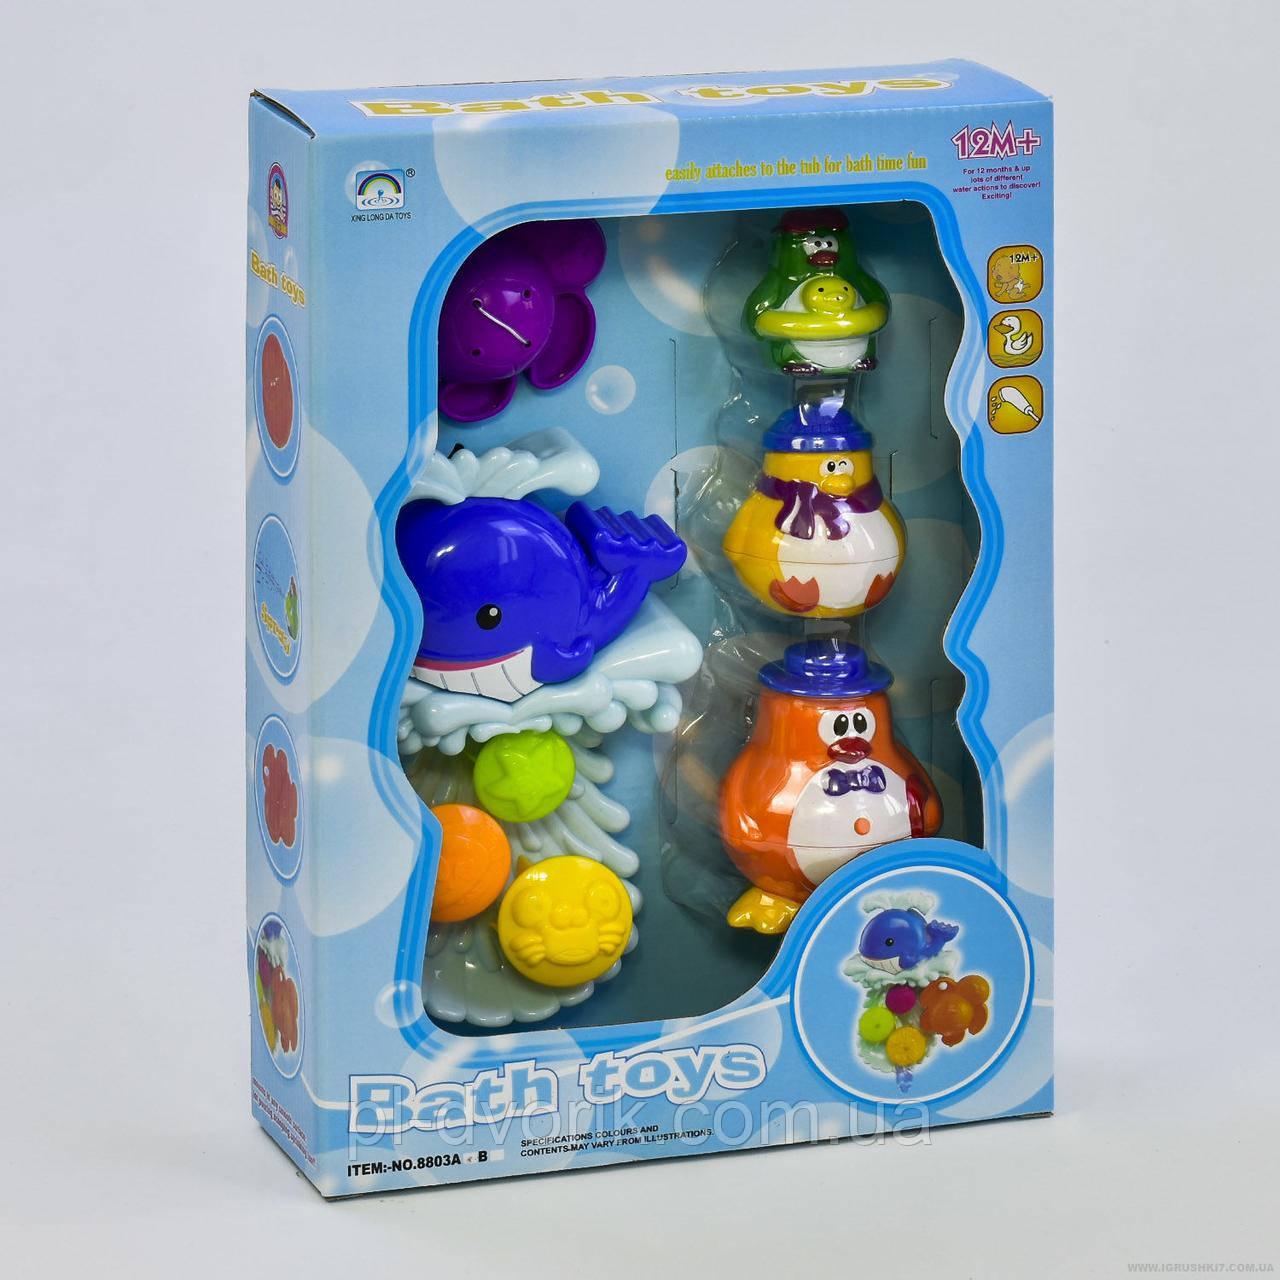 Водопад 8803 А (24) Кит и пингвинчики, в коробке Размер упаковки: 25 х 8 х 37 см Упаковка: Коробка     Забав